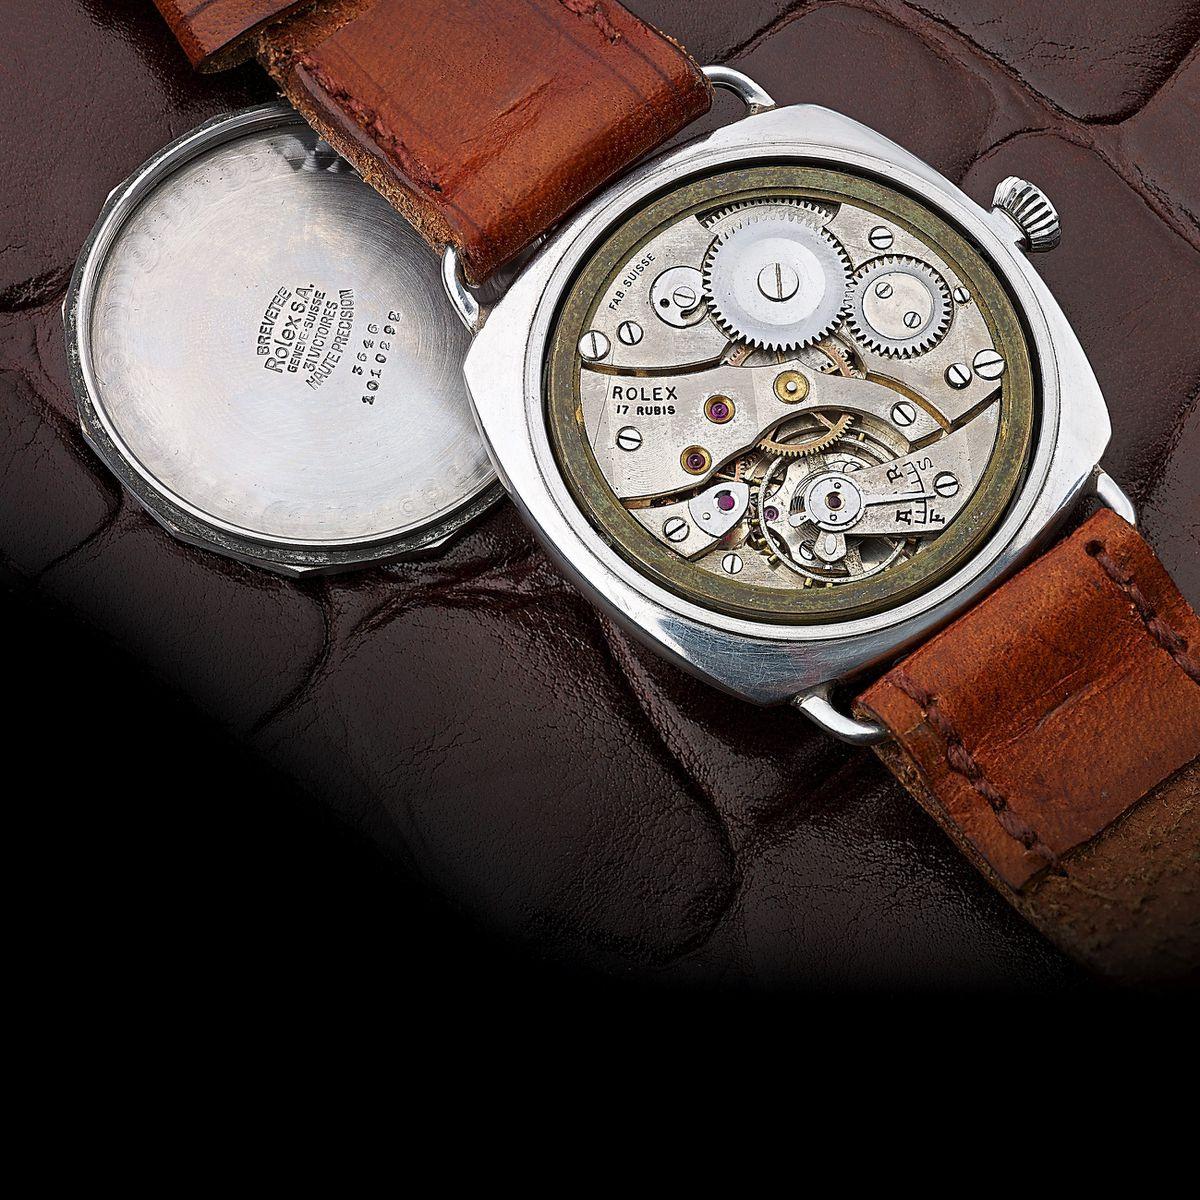 The Rolex Panerai Military Diver's watch